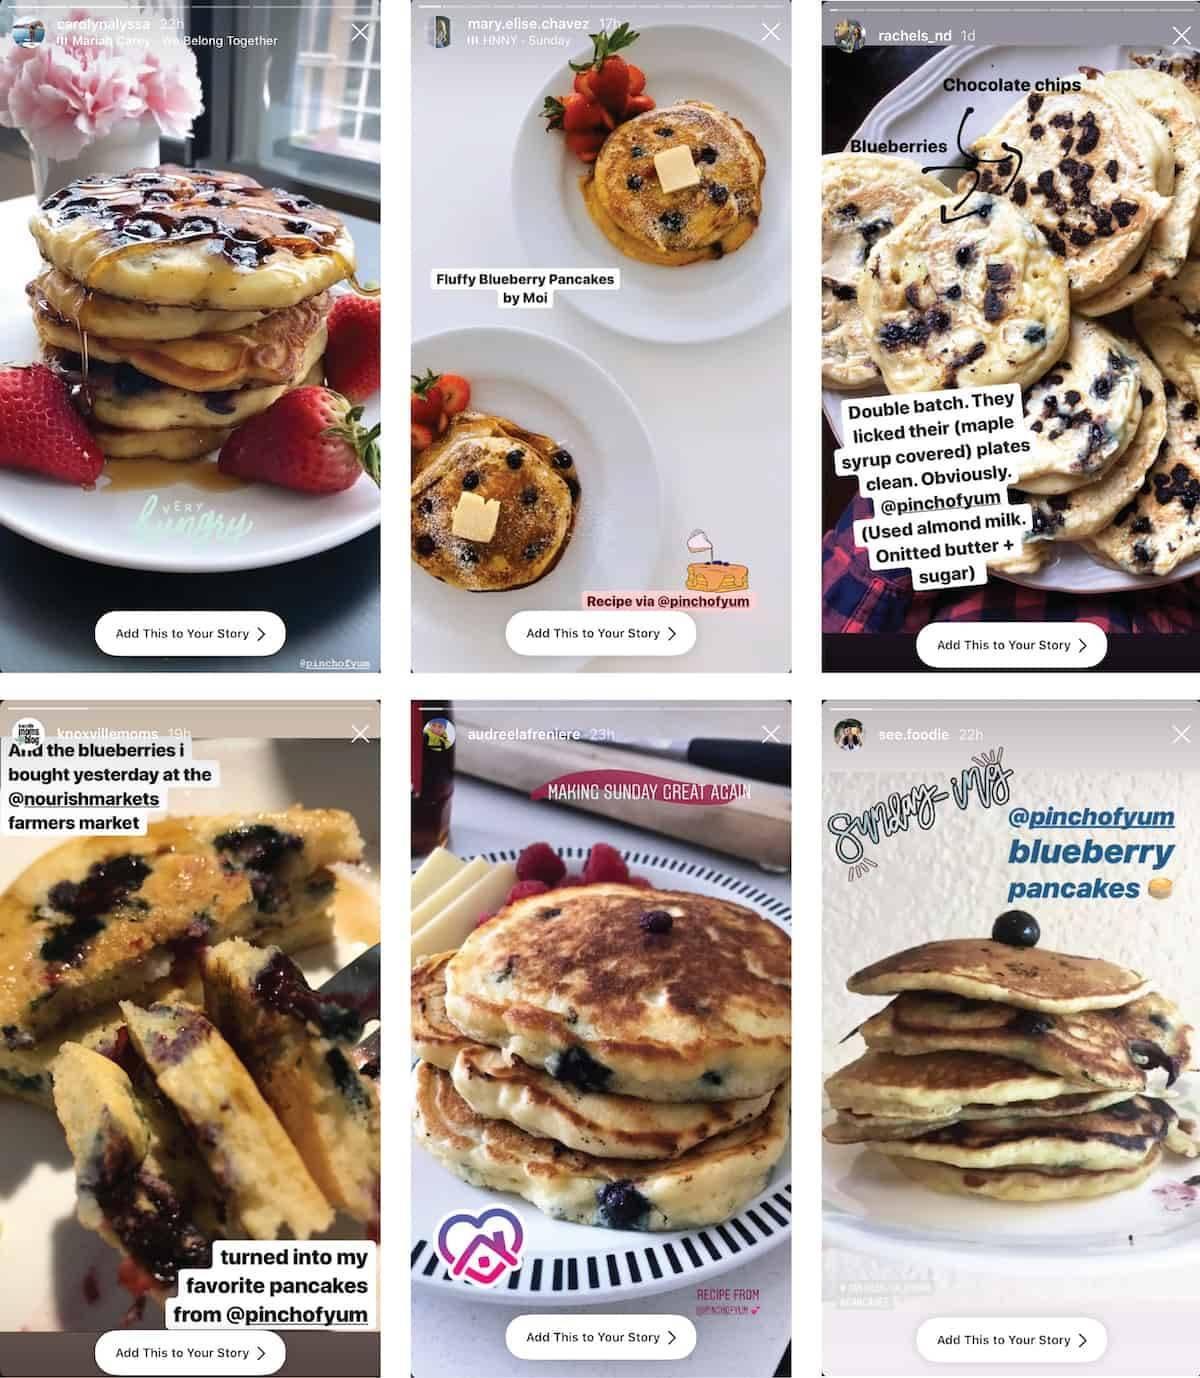 blueberry pancakes, Pinch of Yum